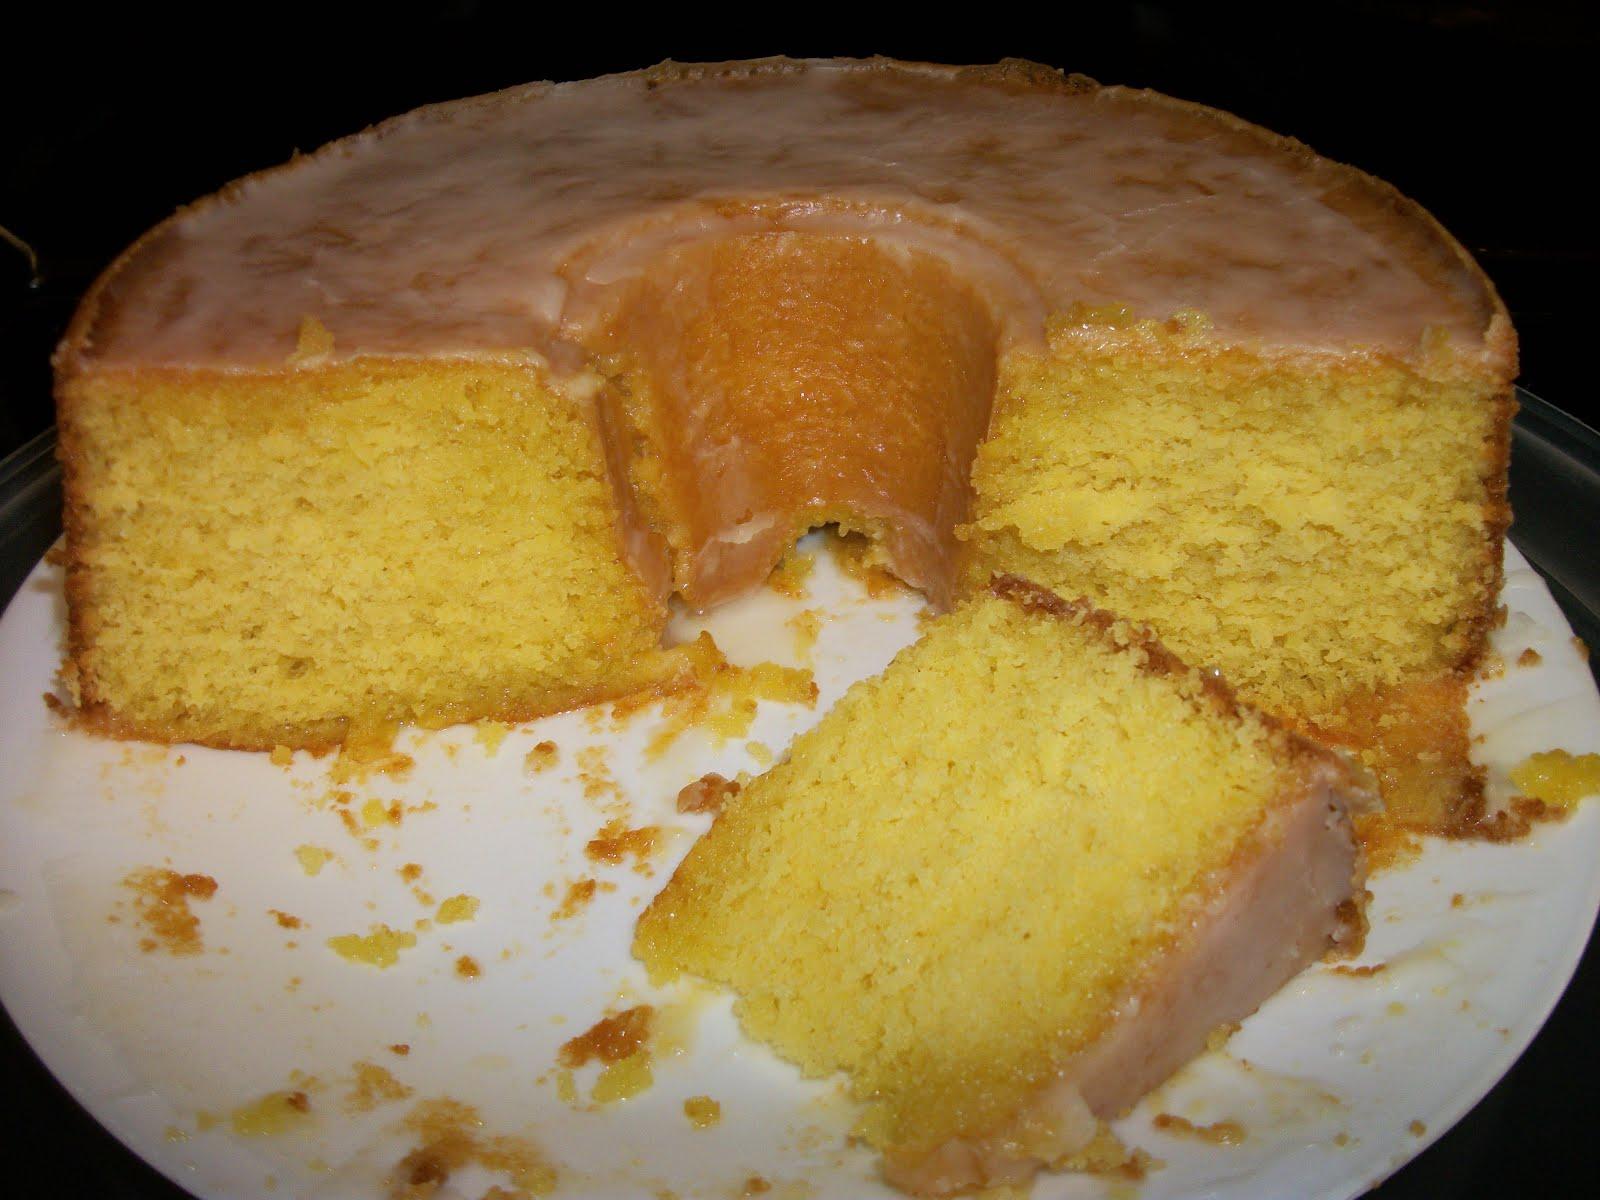 Cake Recipe With Lemon Jello: Yum, Let's Eat!: Mom's Lemon Jell-O Cake